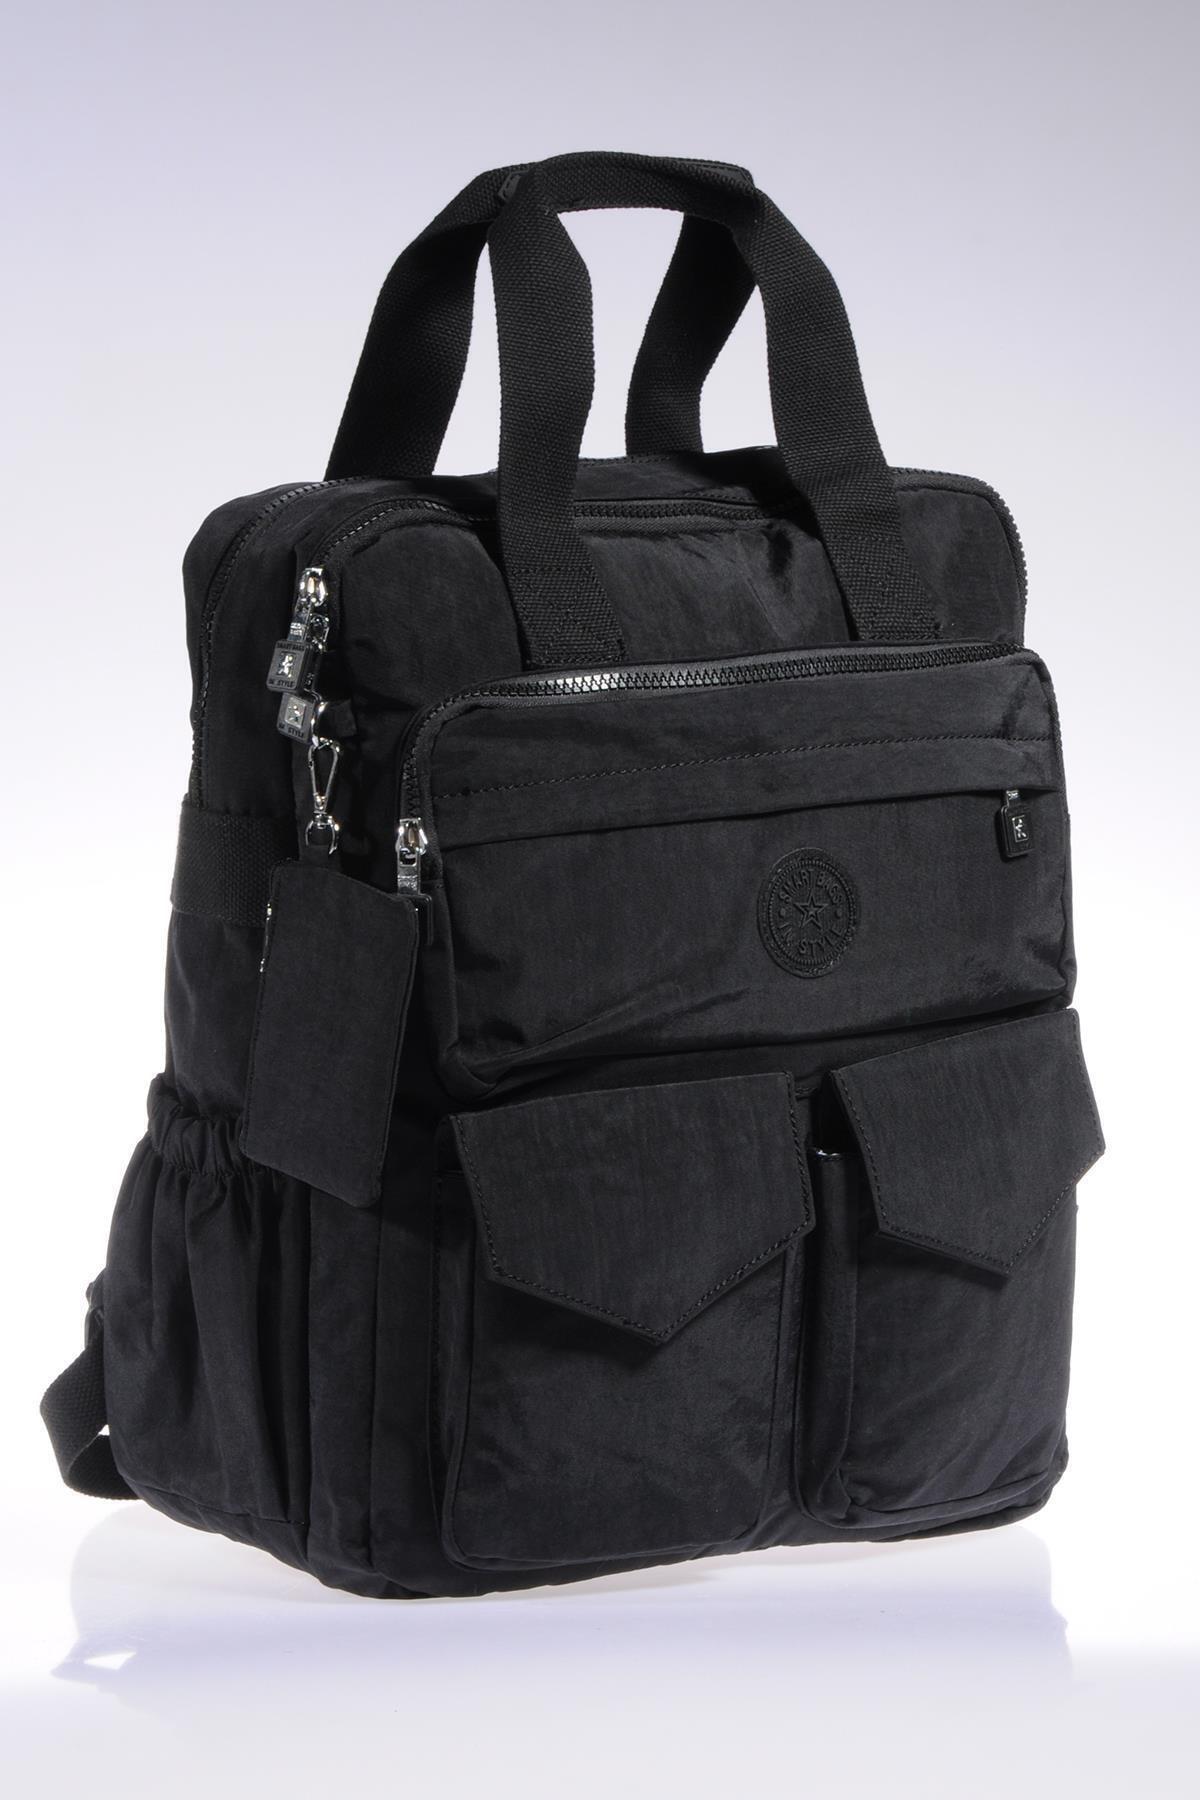 SMART BAGS Smb1175-0001 Siyah Kadın Sırt Çantası 2